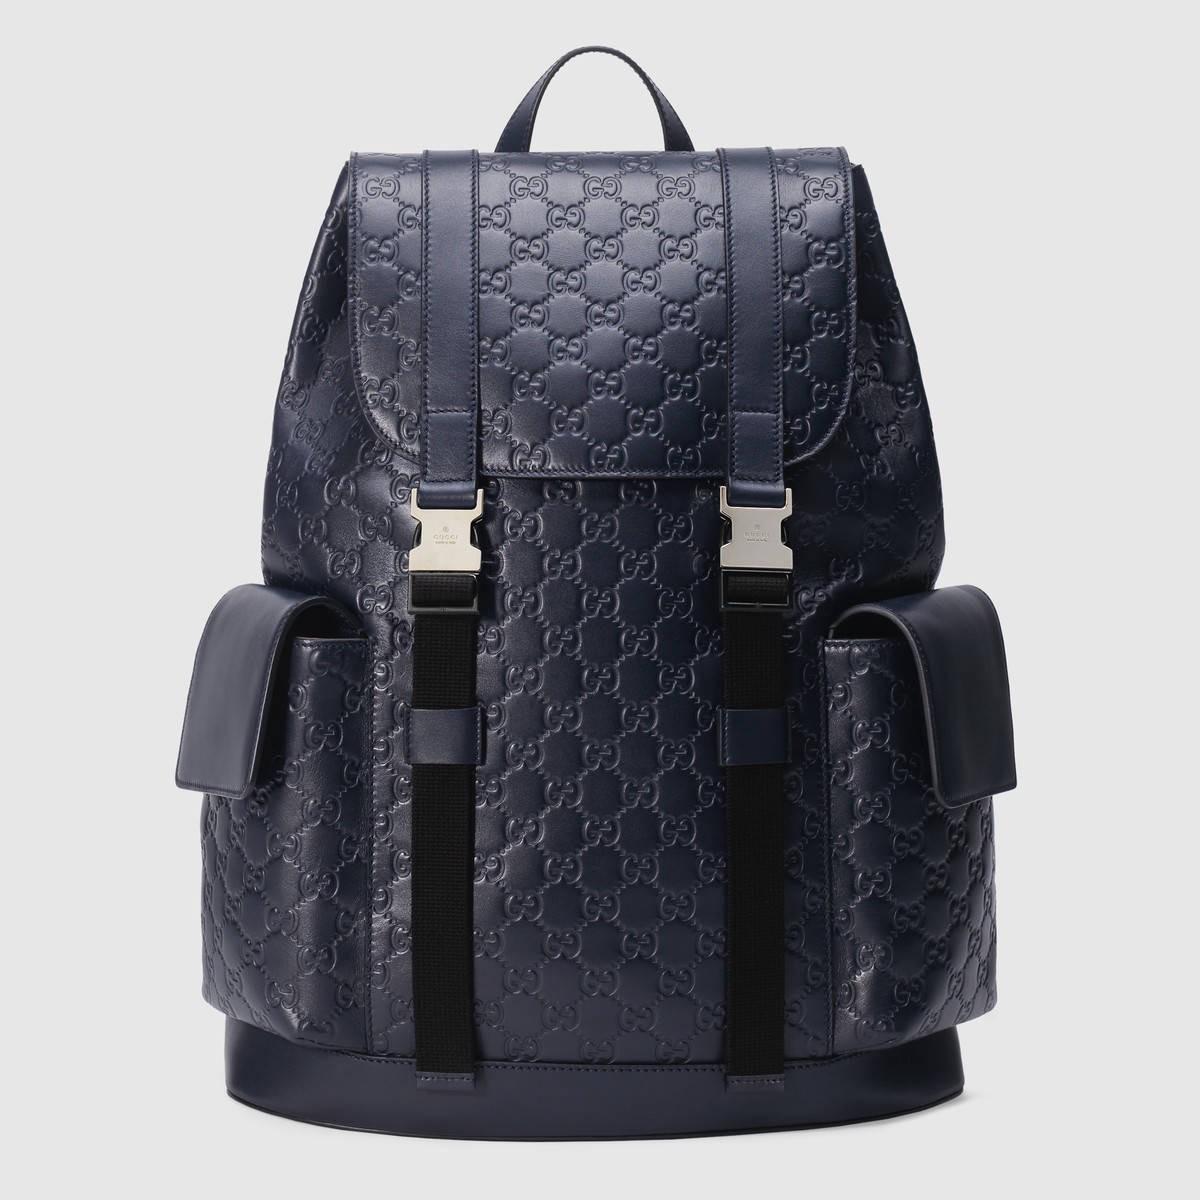 Gucci  Gucci Signature backpack - blue Gucci Signature